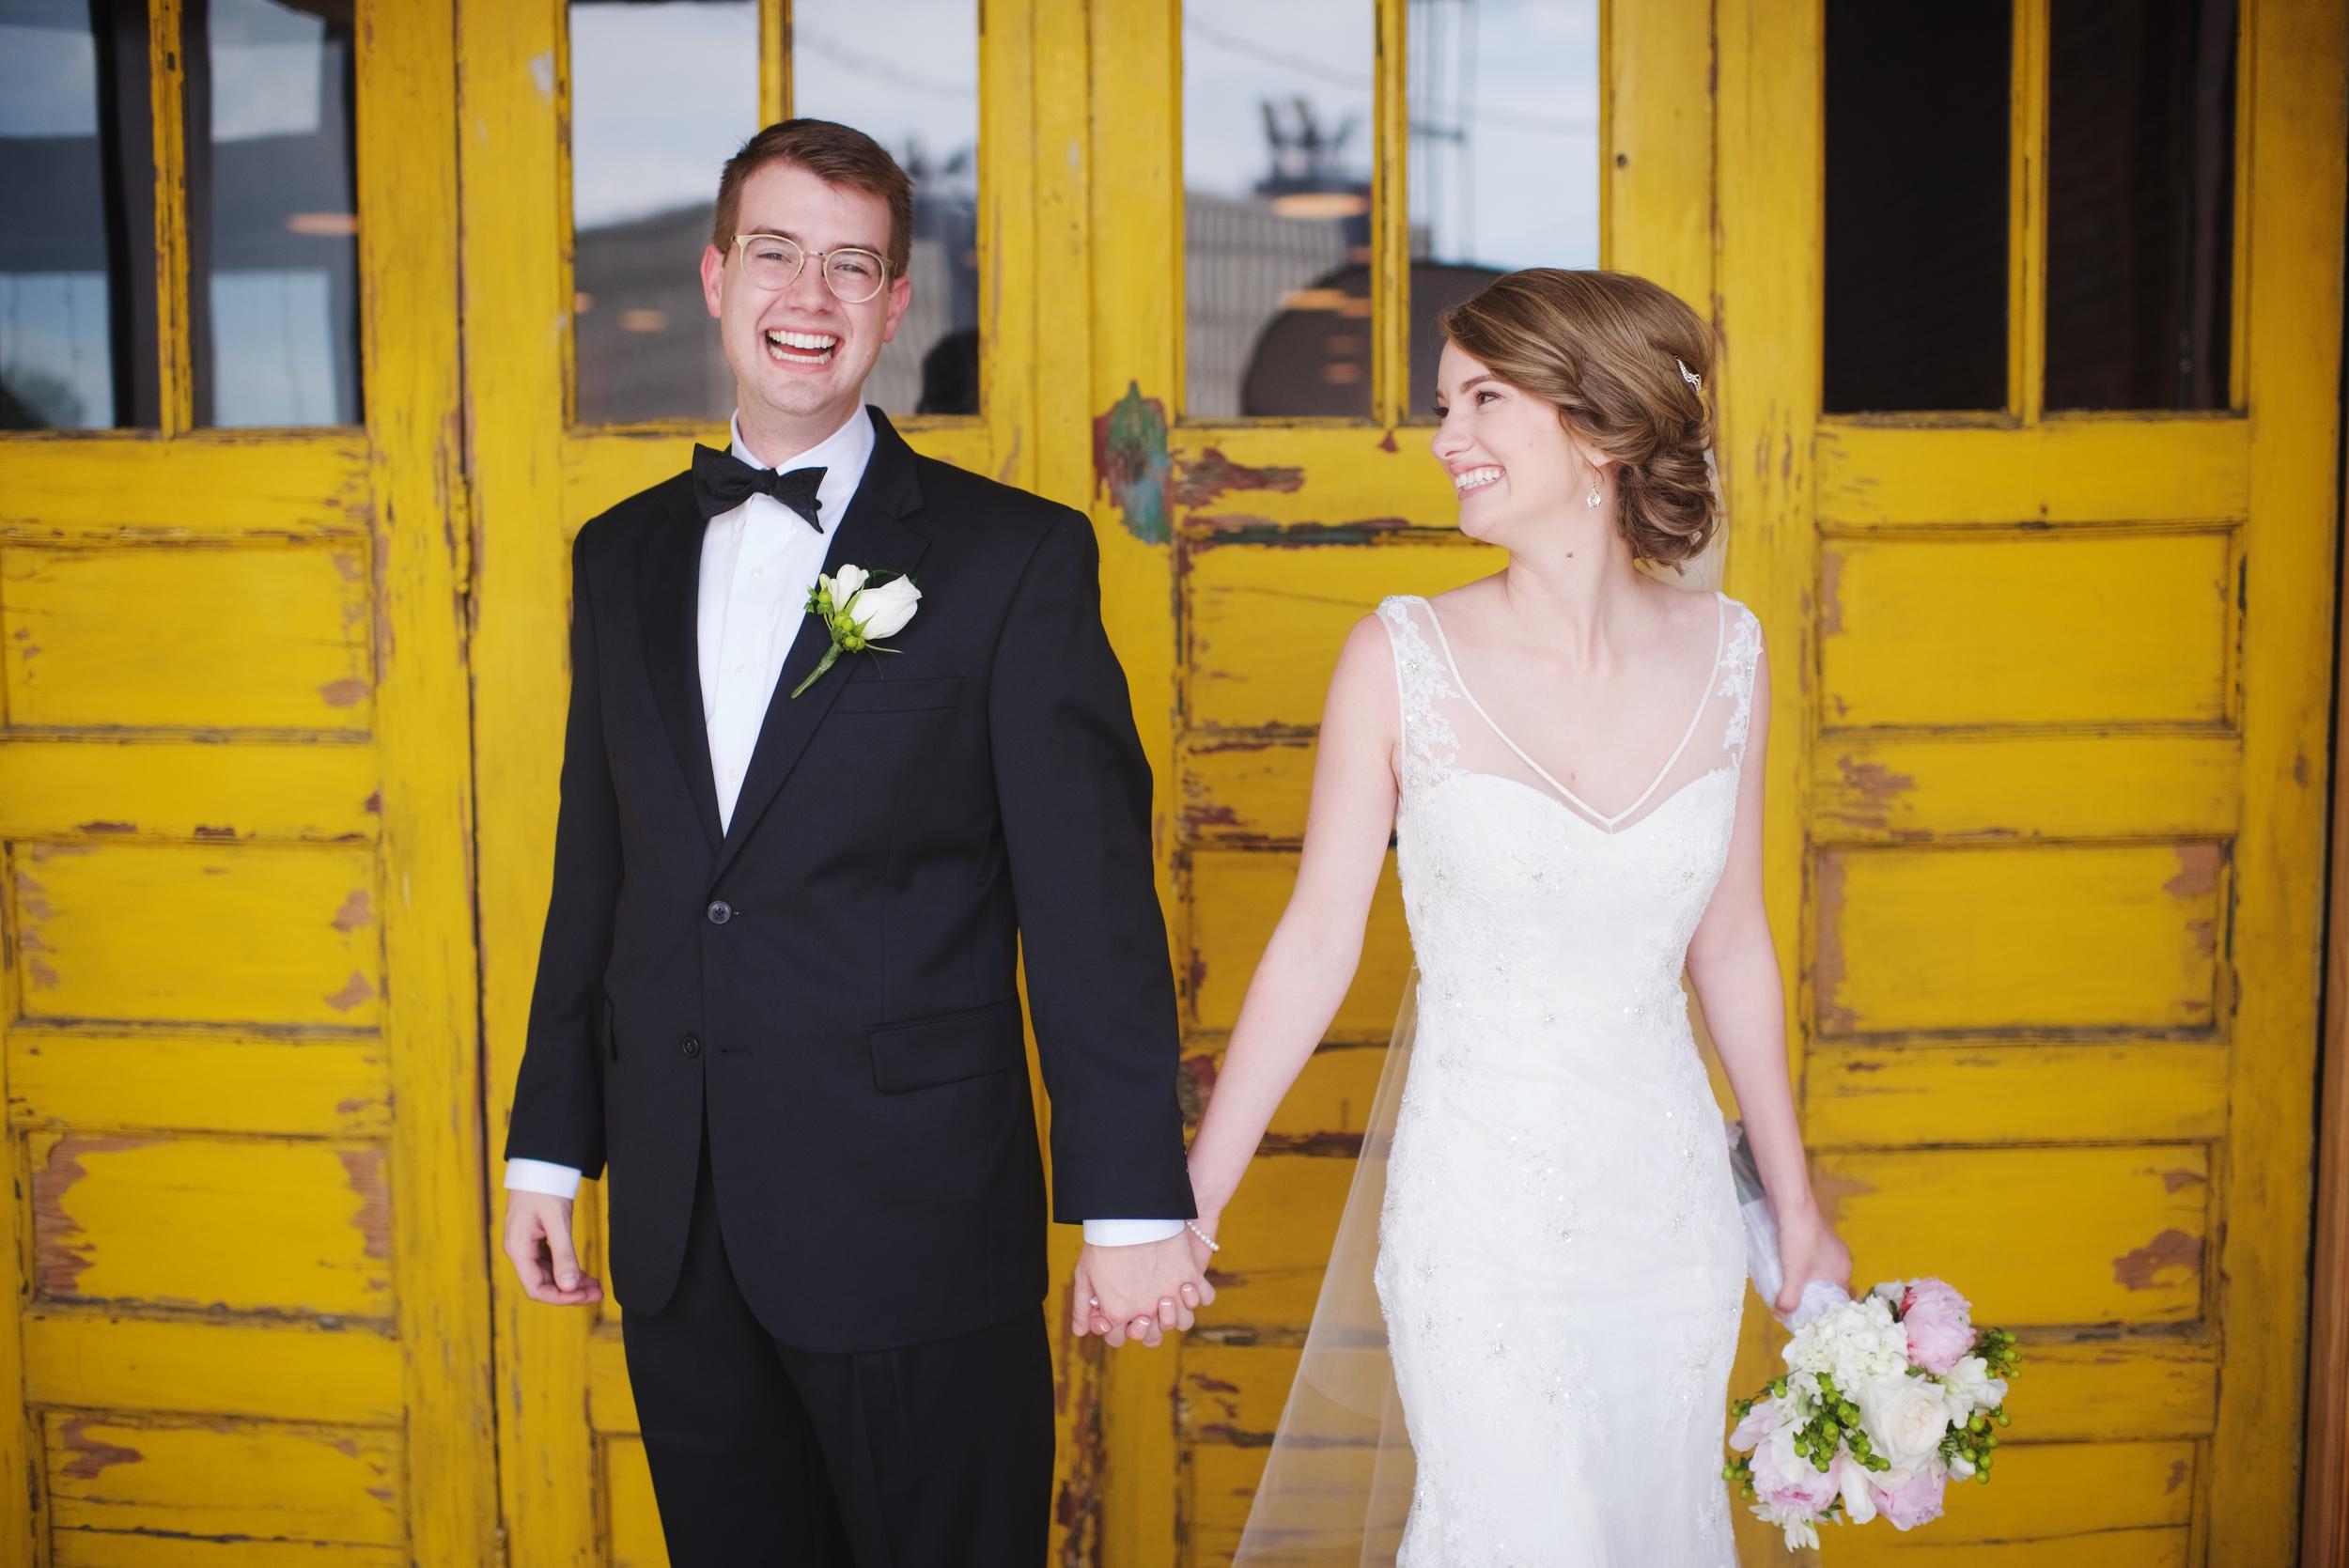 HnA_wedding_BrideGroom 137.jpg